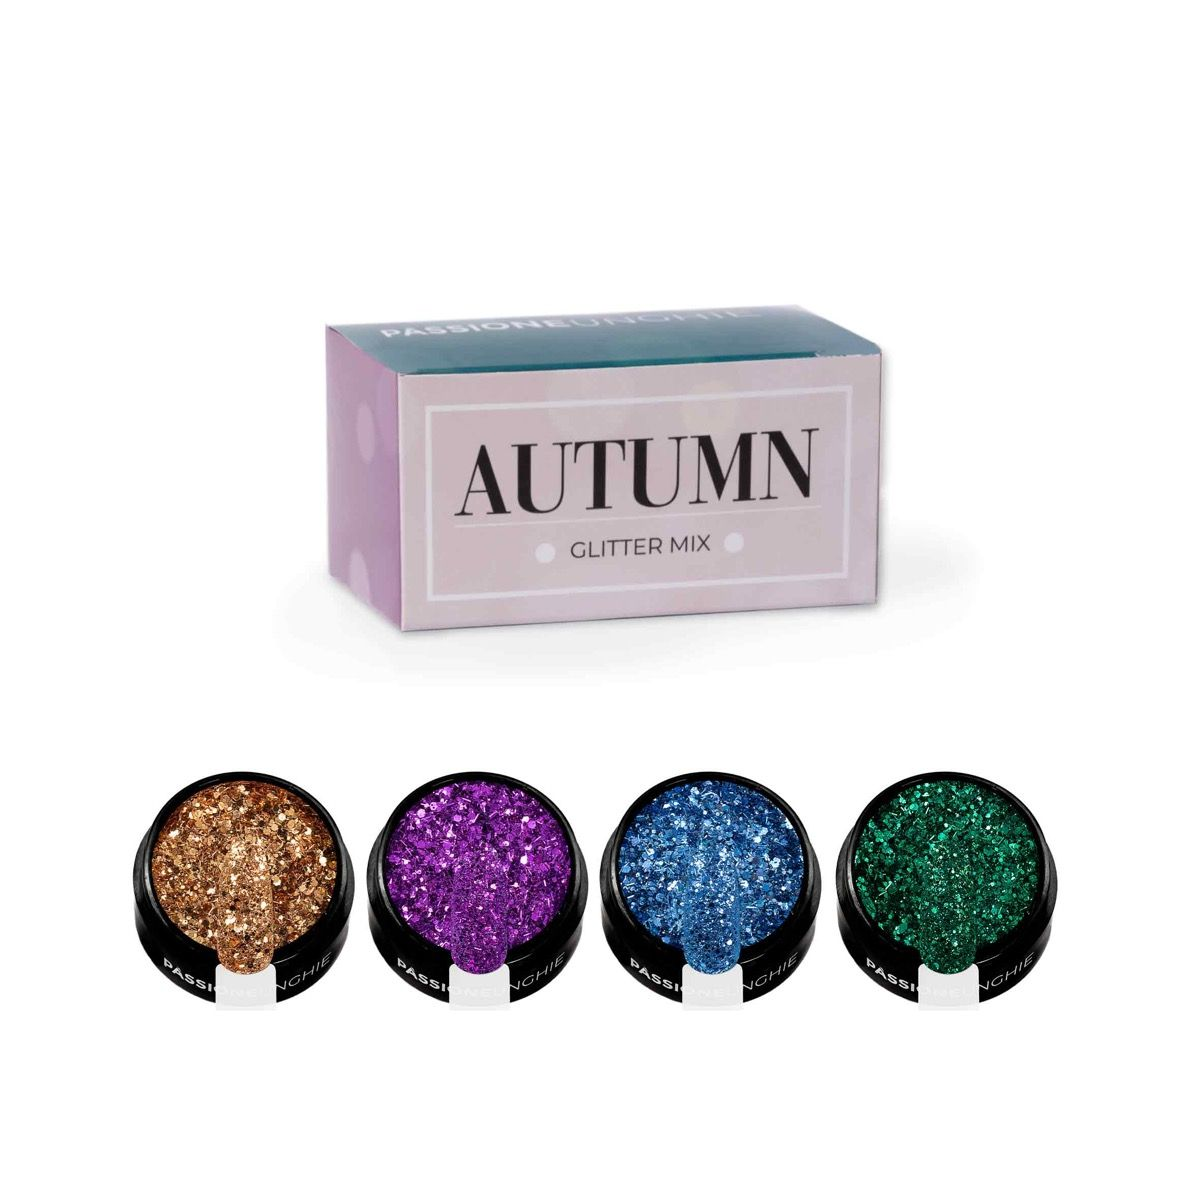 Autumn Glitter Mix